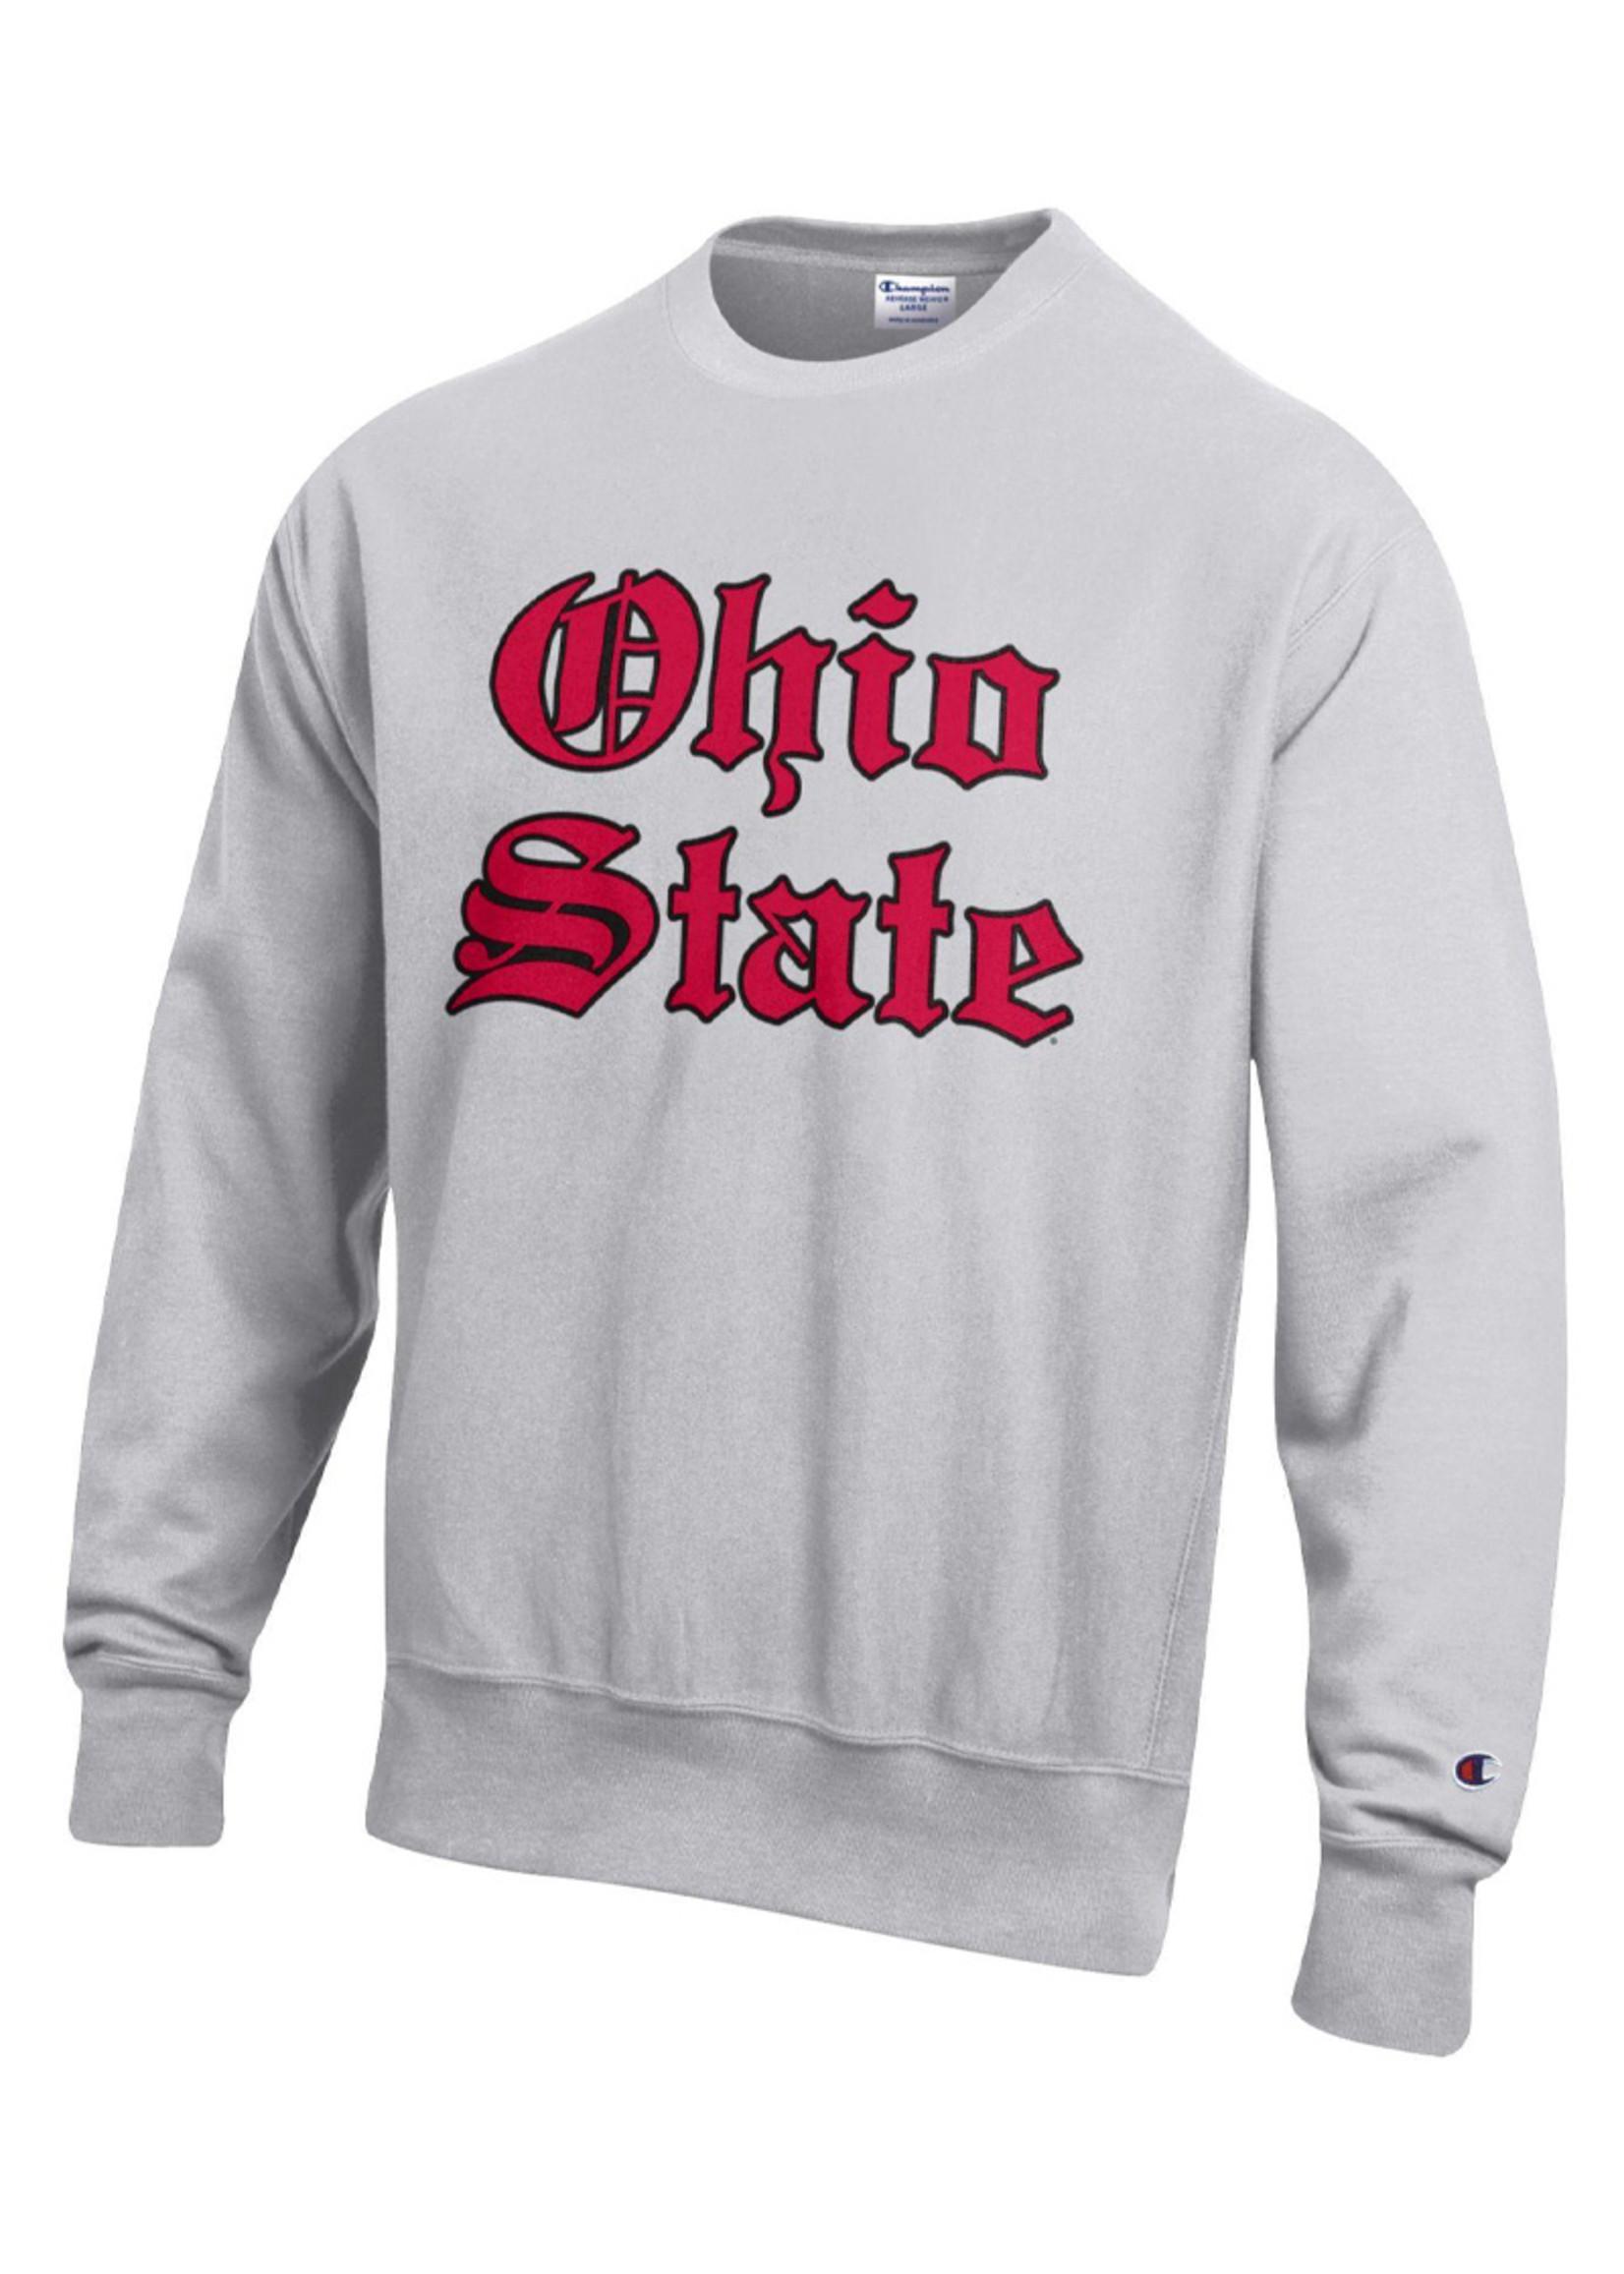 Champion Ohio State Buckeyes Old English Reverse Weave Crewneck